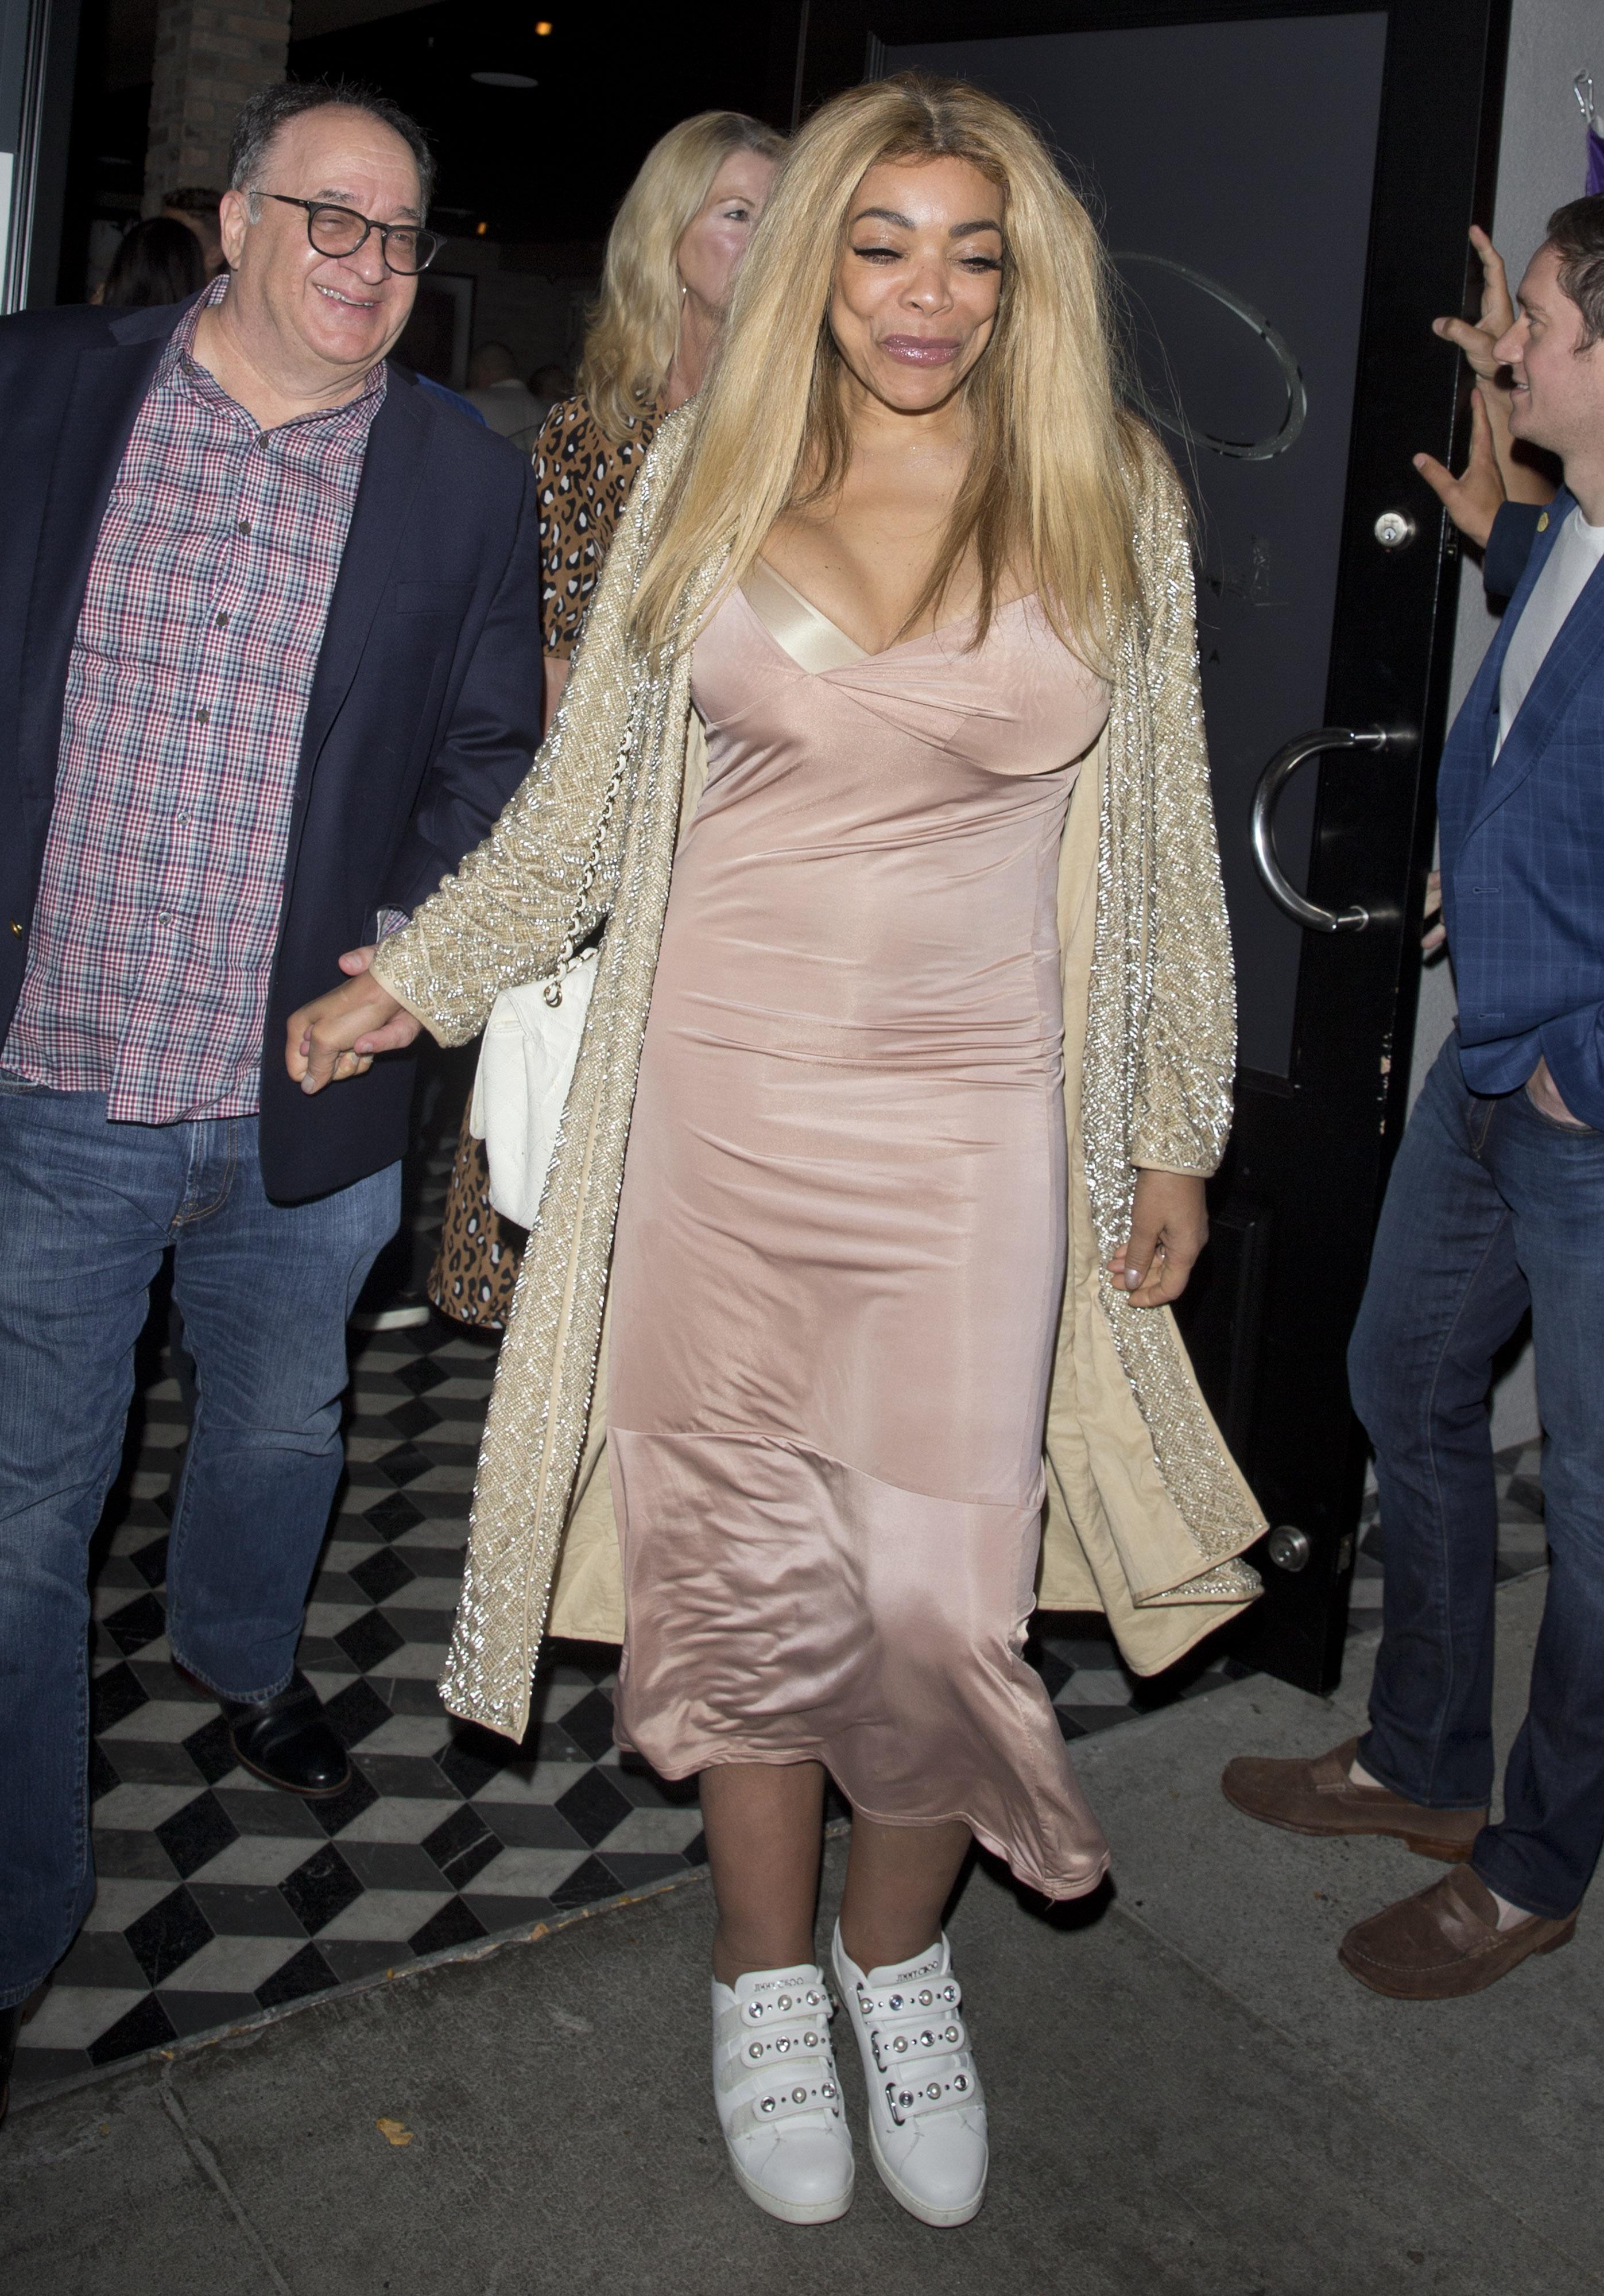 Wendy Williams Rips Kim Kardashian for Selfish Baby